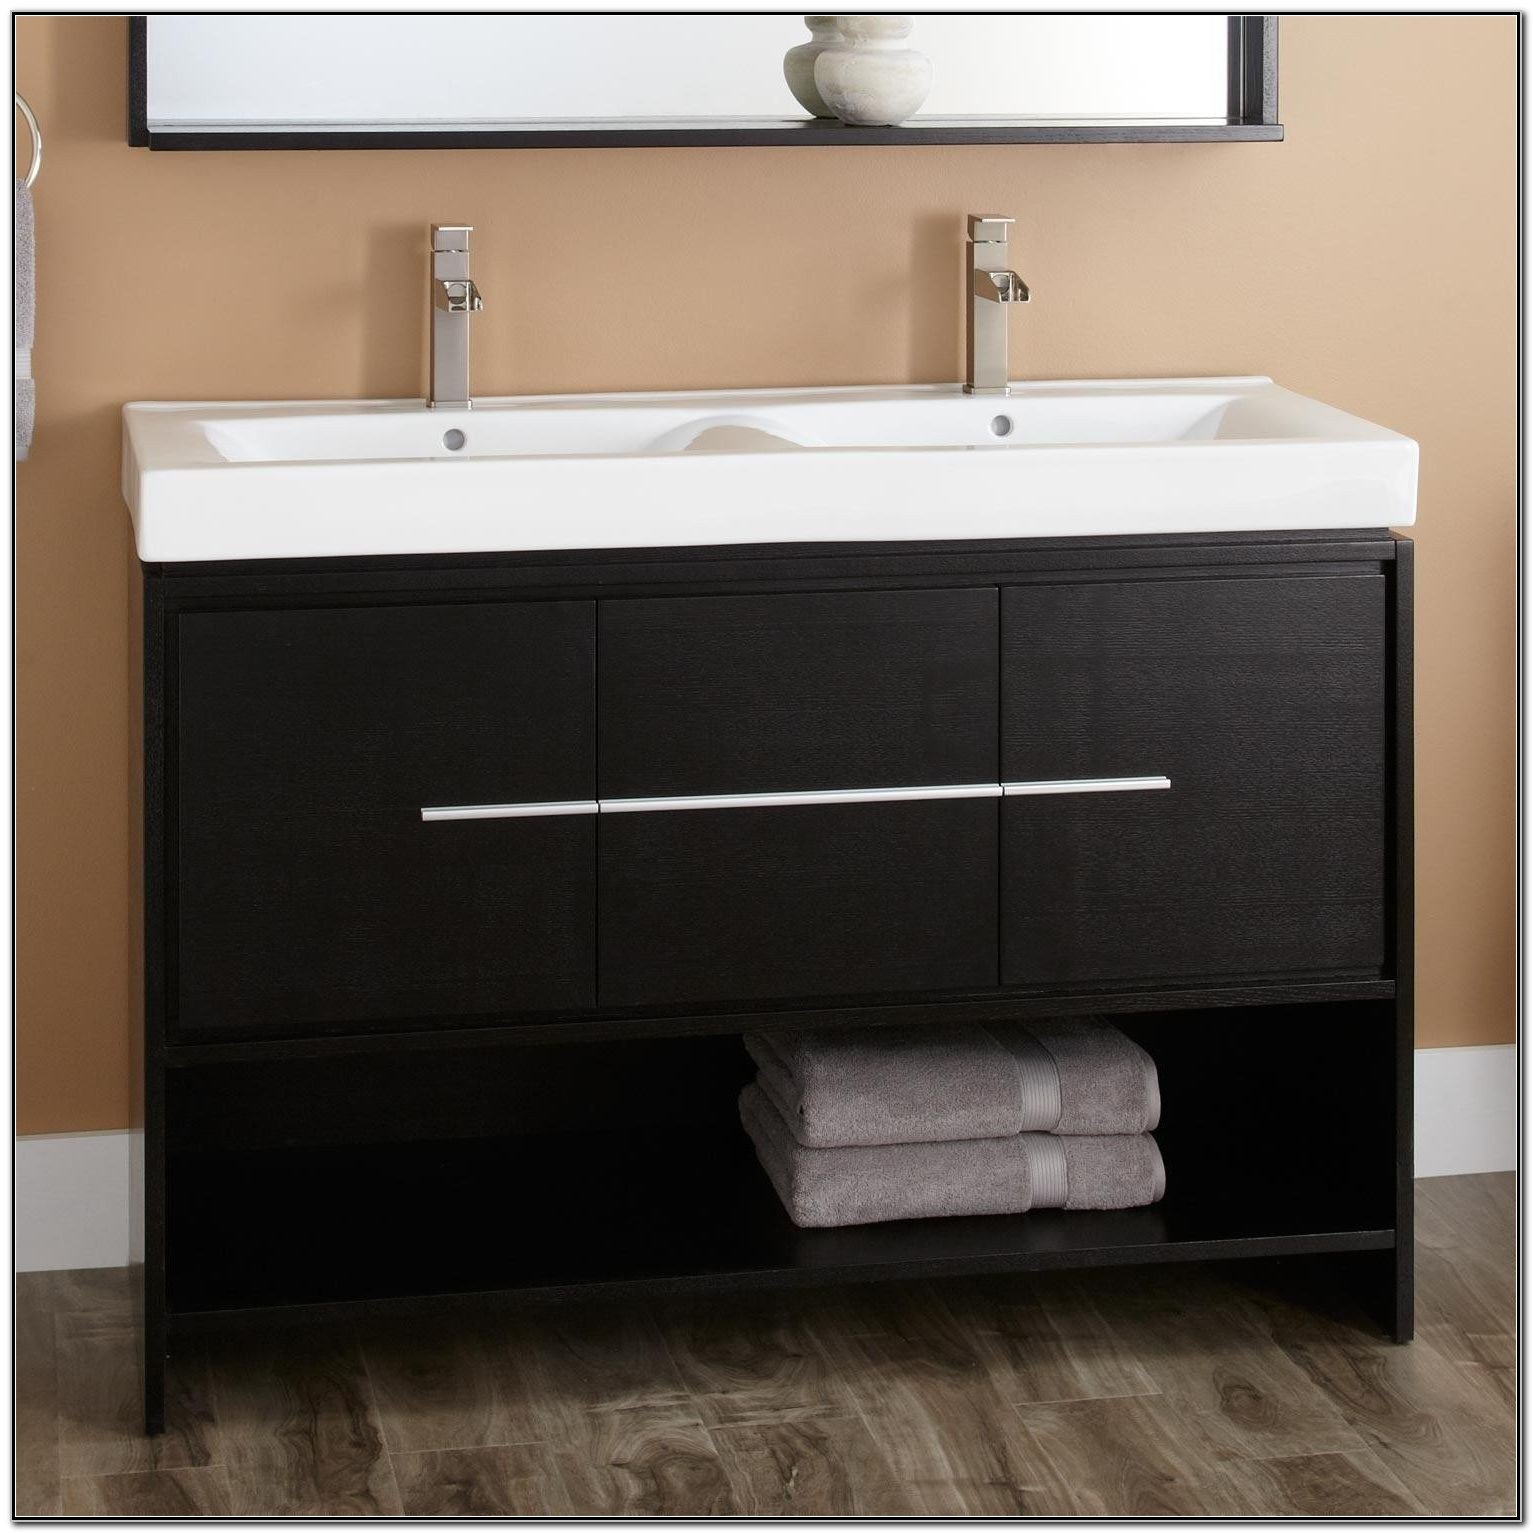 Bathroom Sinks And Vanities Cheap